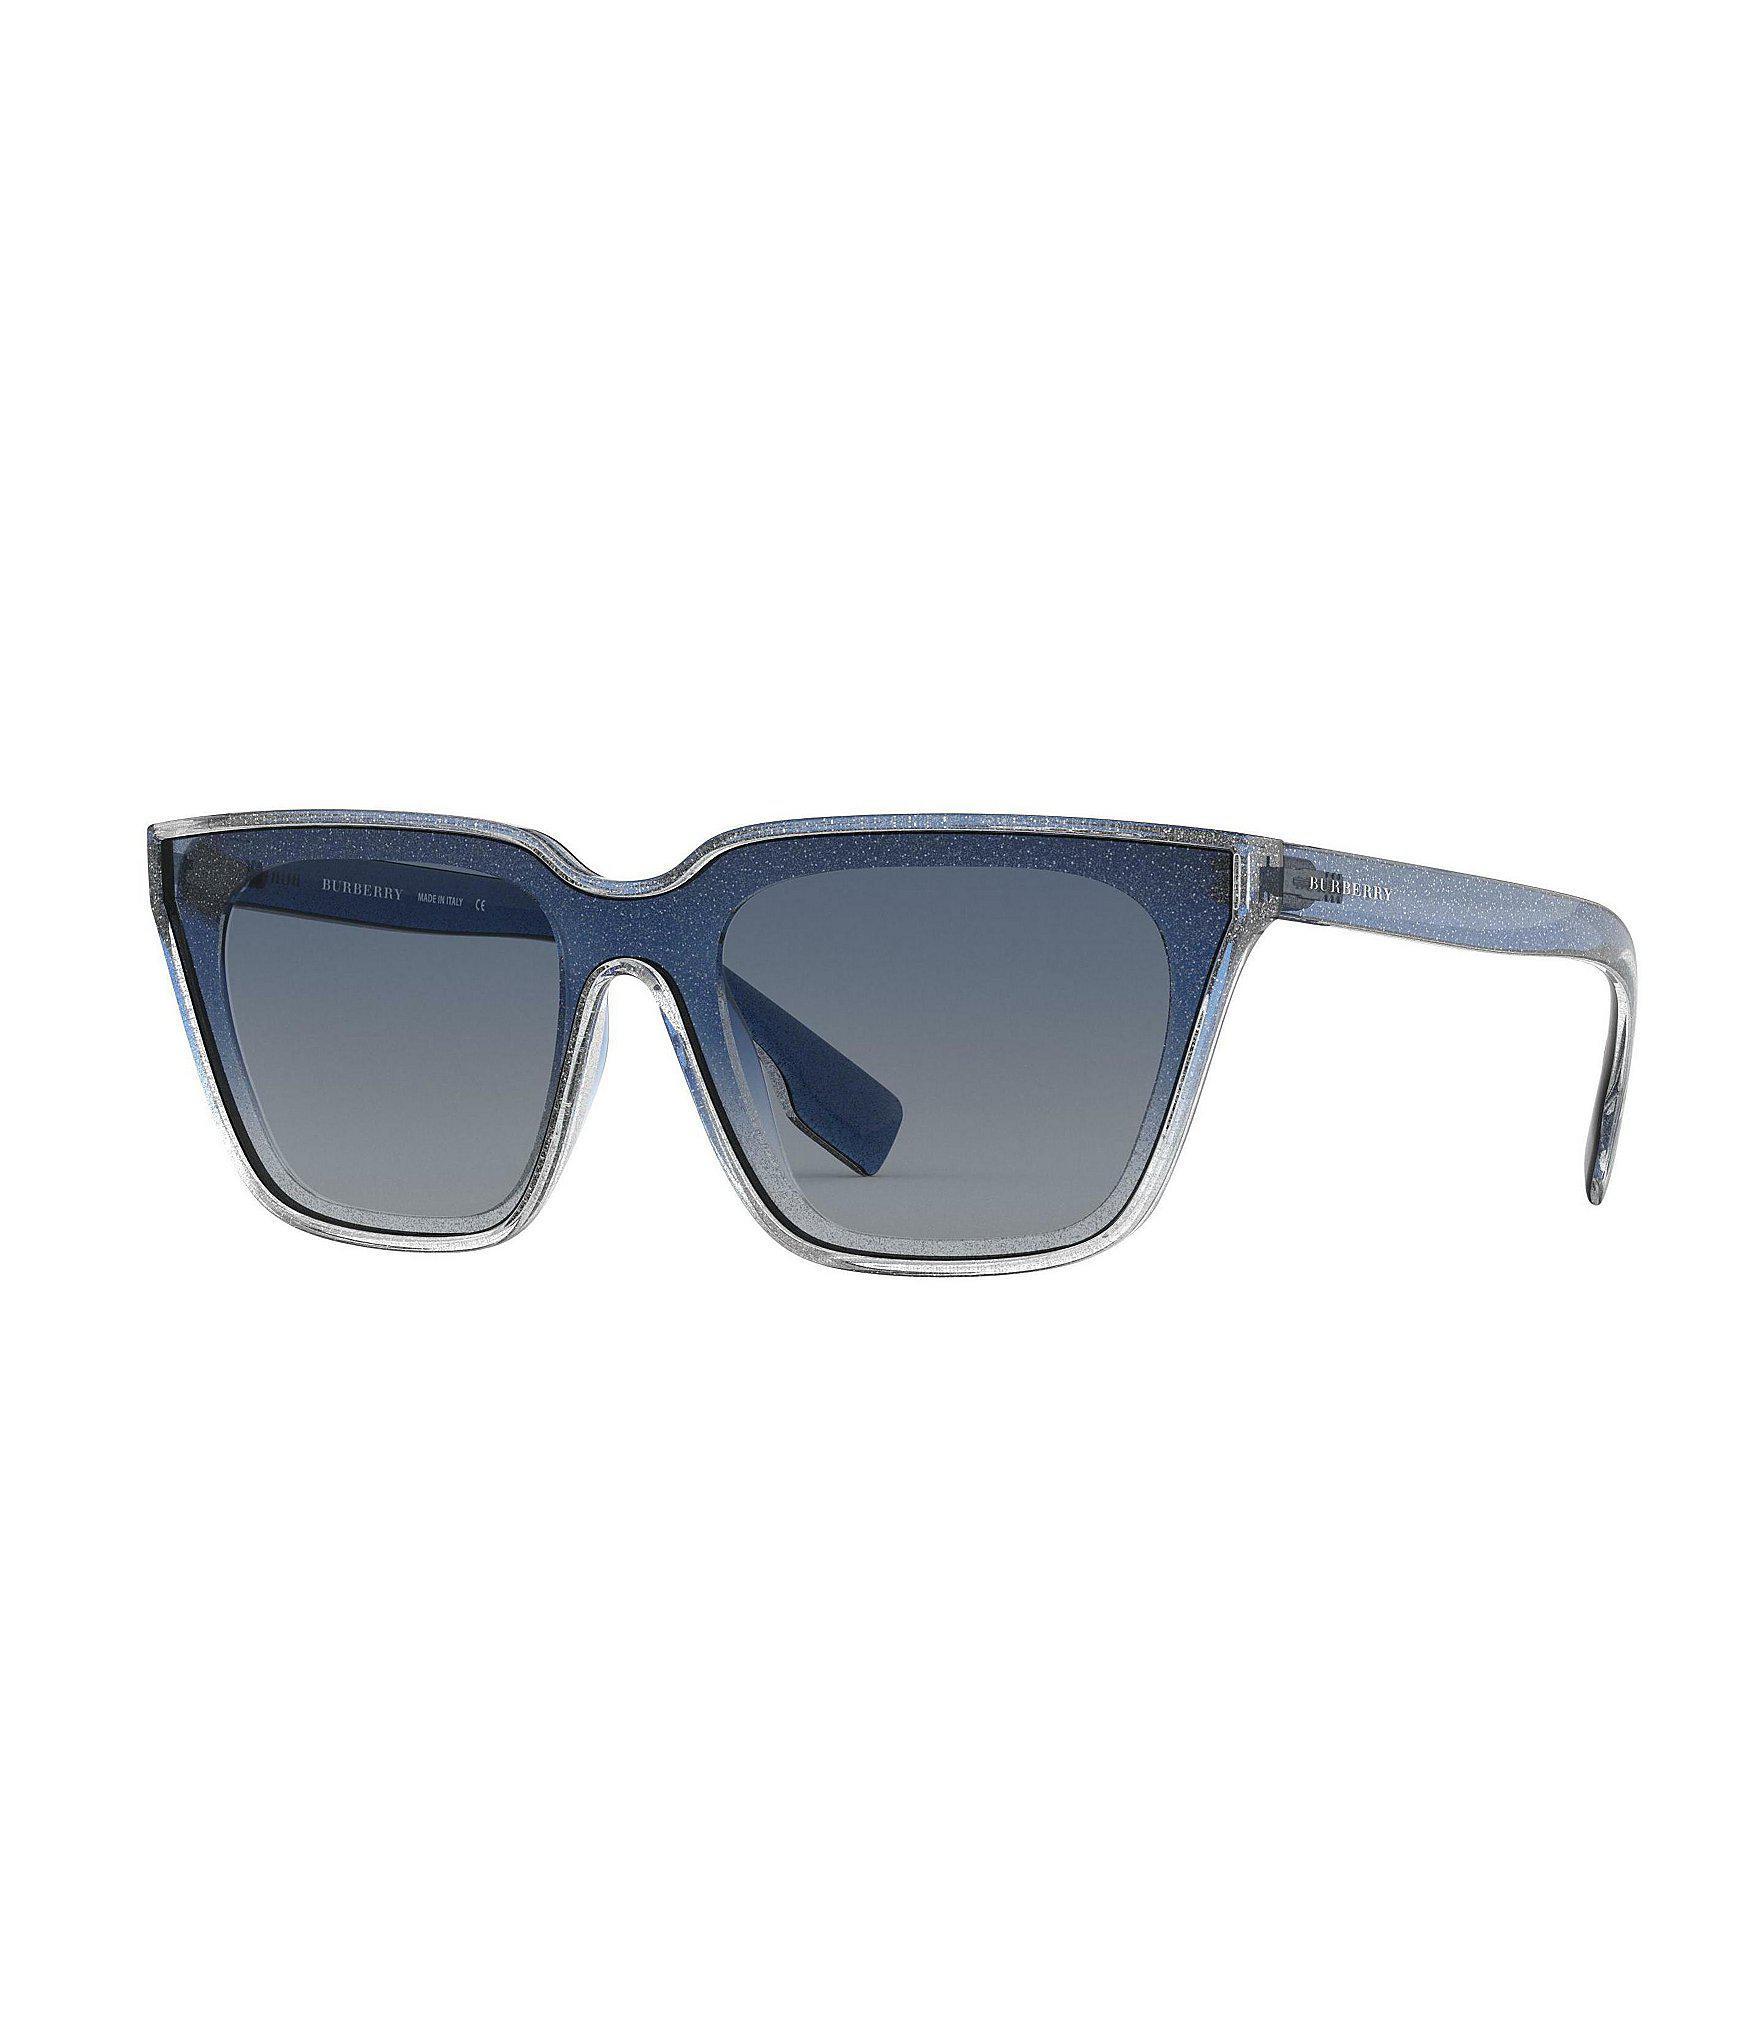 74b251665d0b Lyst - Burberry Comet Square Glitter Sunglasses in Blue